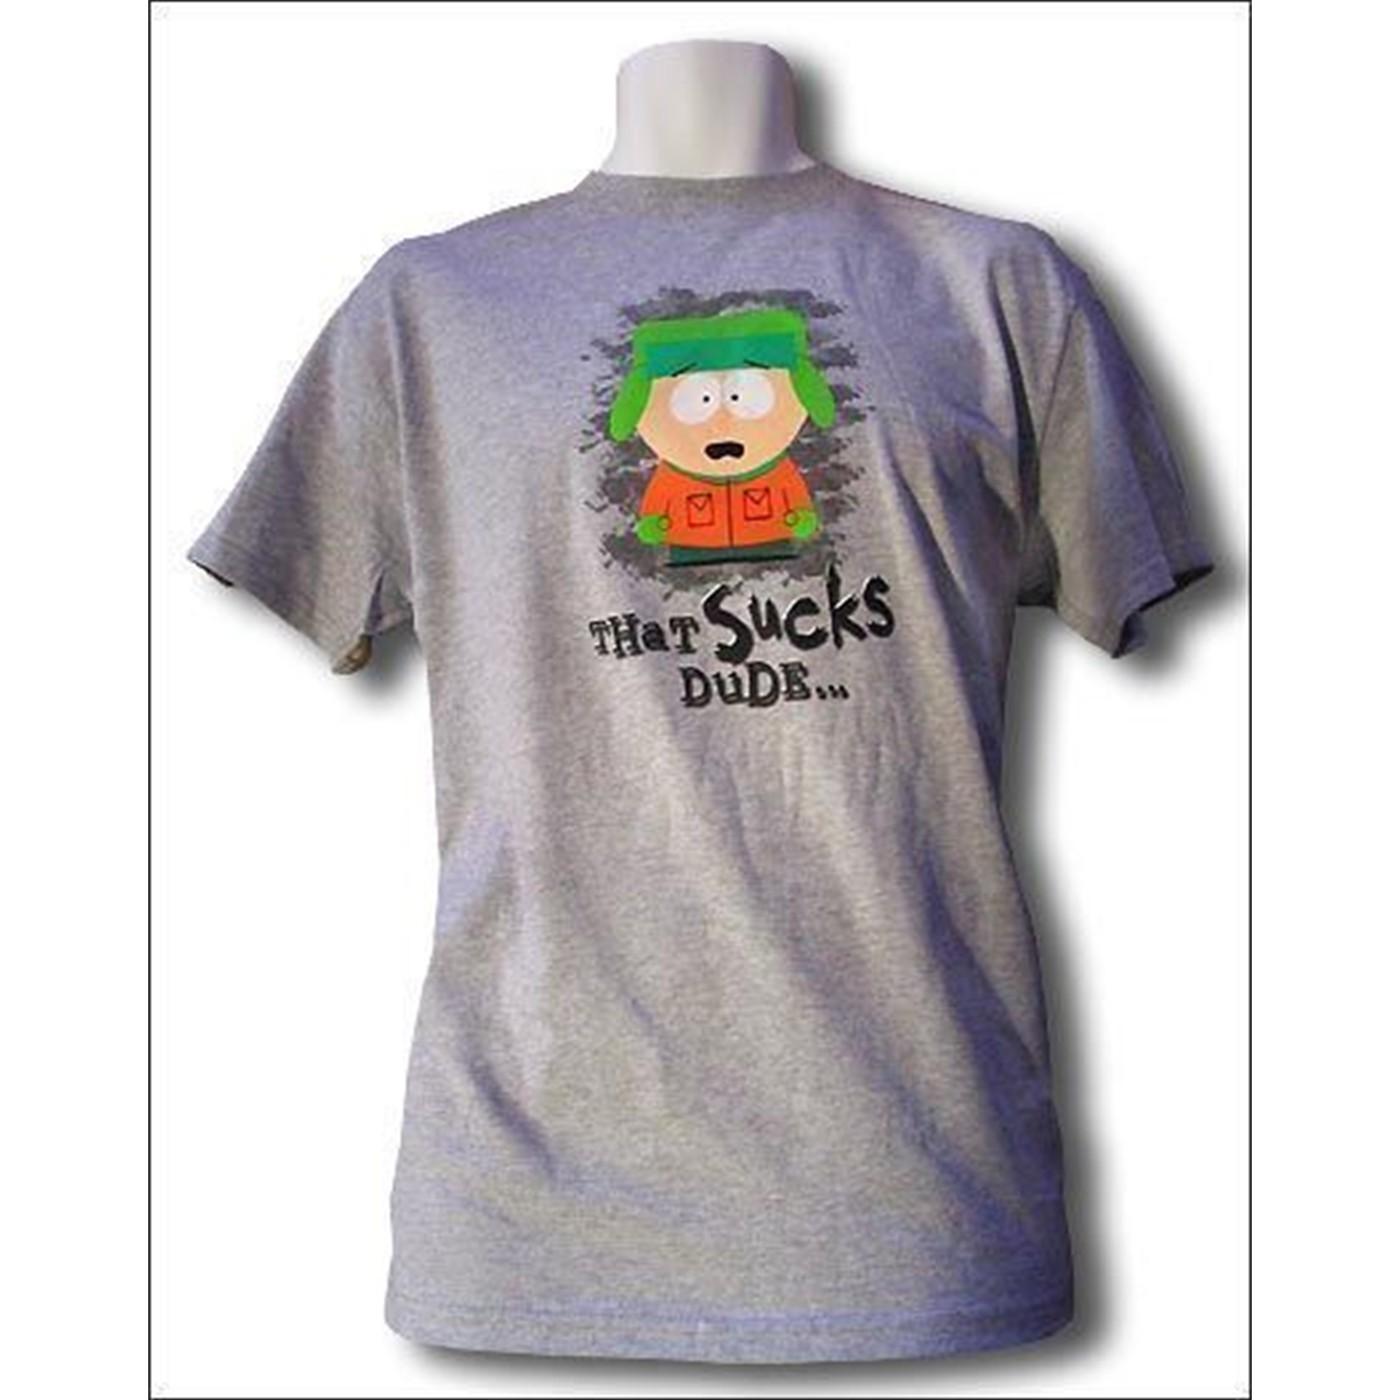 Southpark: That Sucks Dude T-shirt